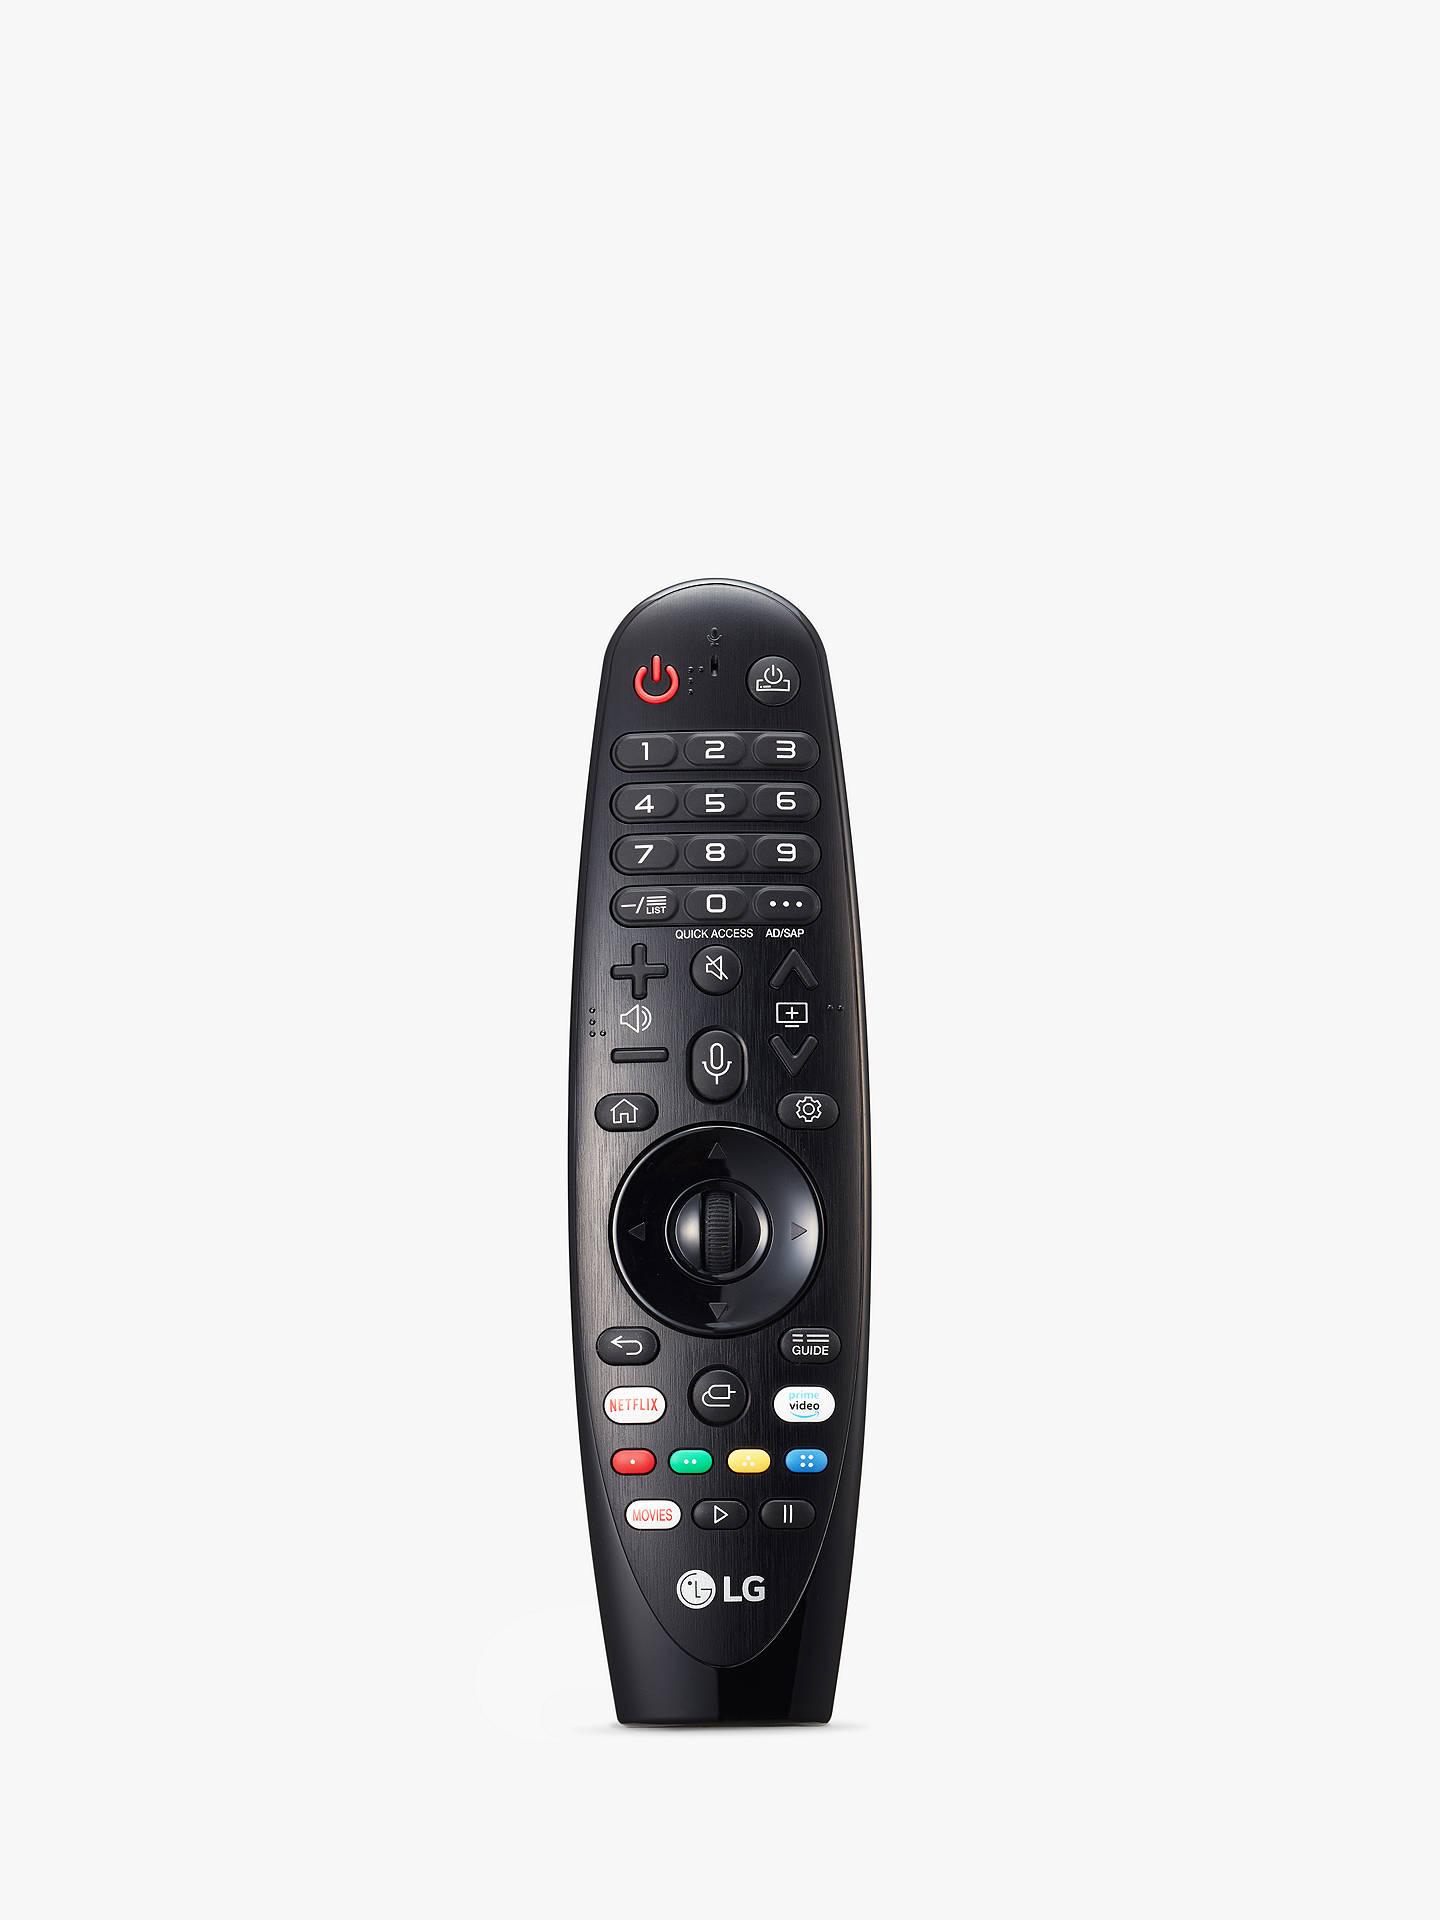 LG 49SM8050PLC (2020) LED HDR NanoCell 4K Ultra HD Smart TV, 49 inch with Freeview Play/Freesat HD, Ceramic Black/Dark Meteor Titan at John Lewis & Partners